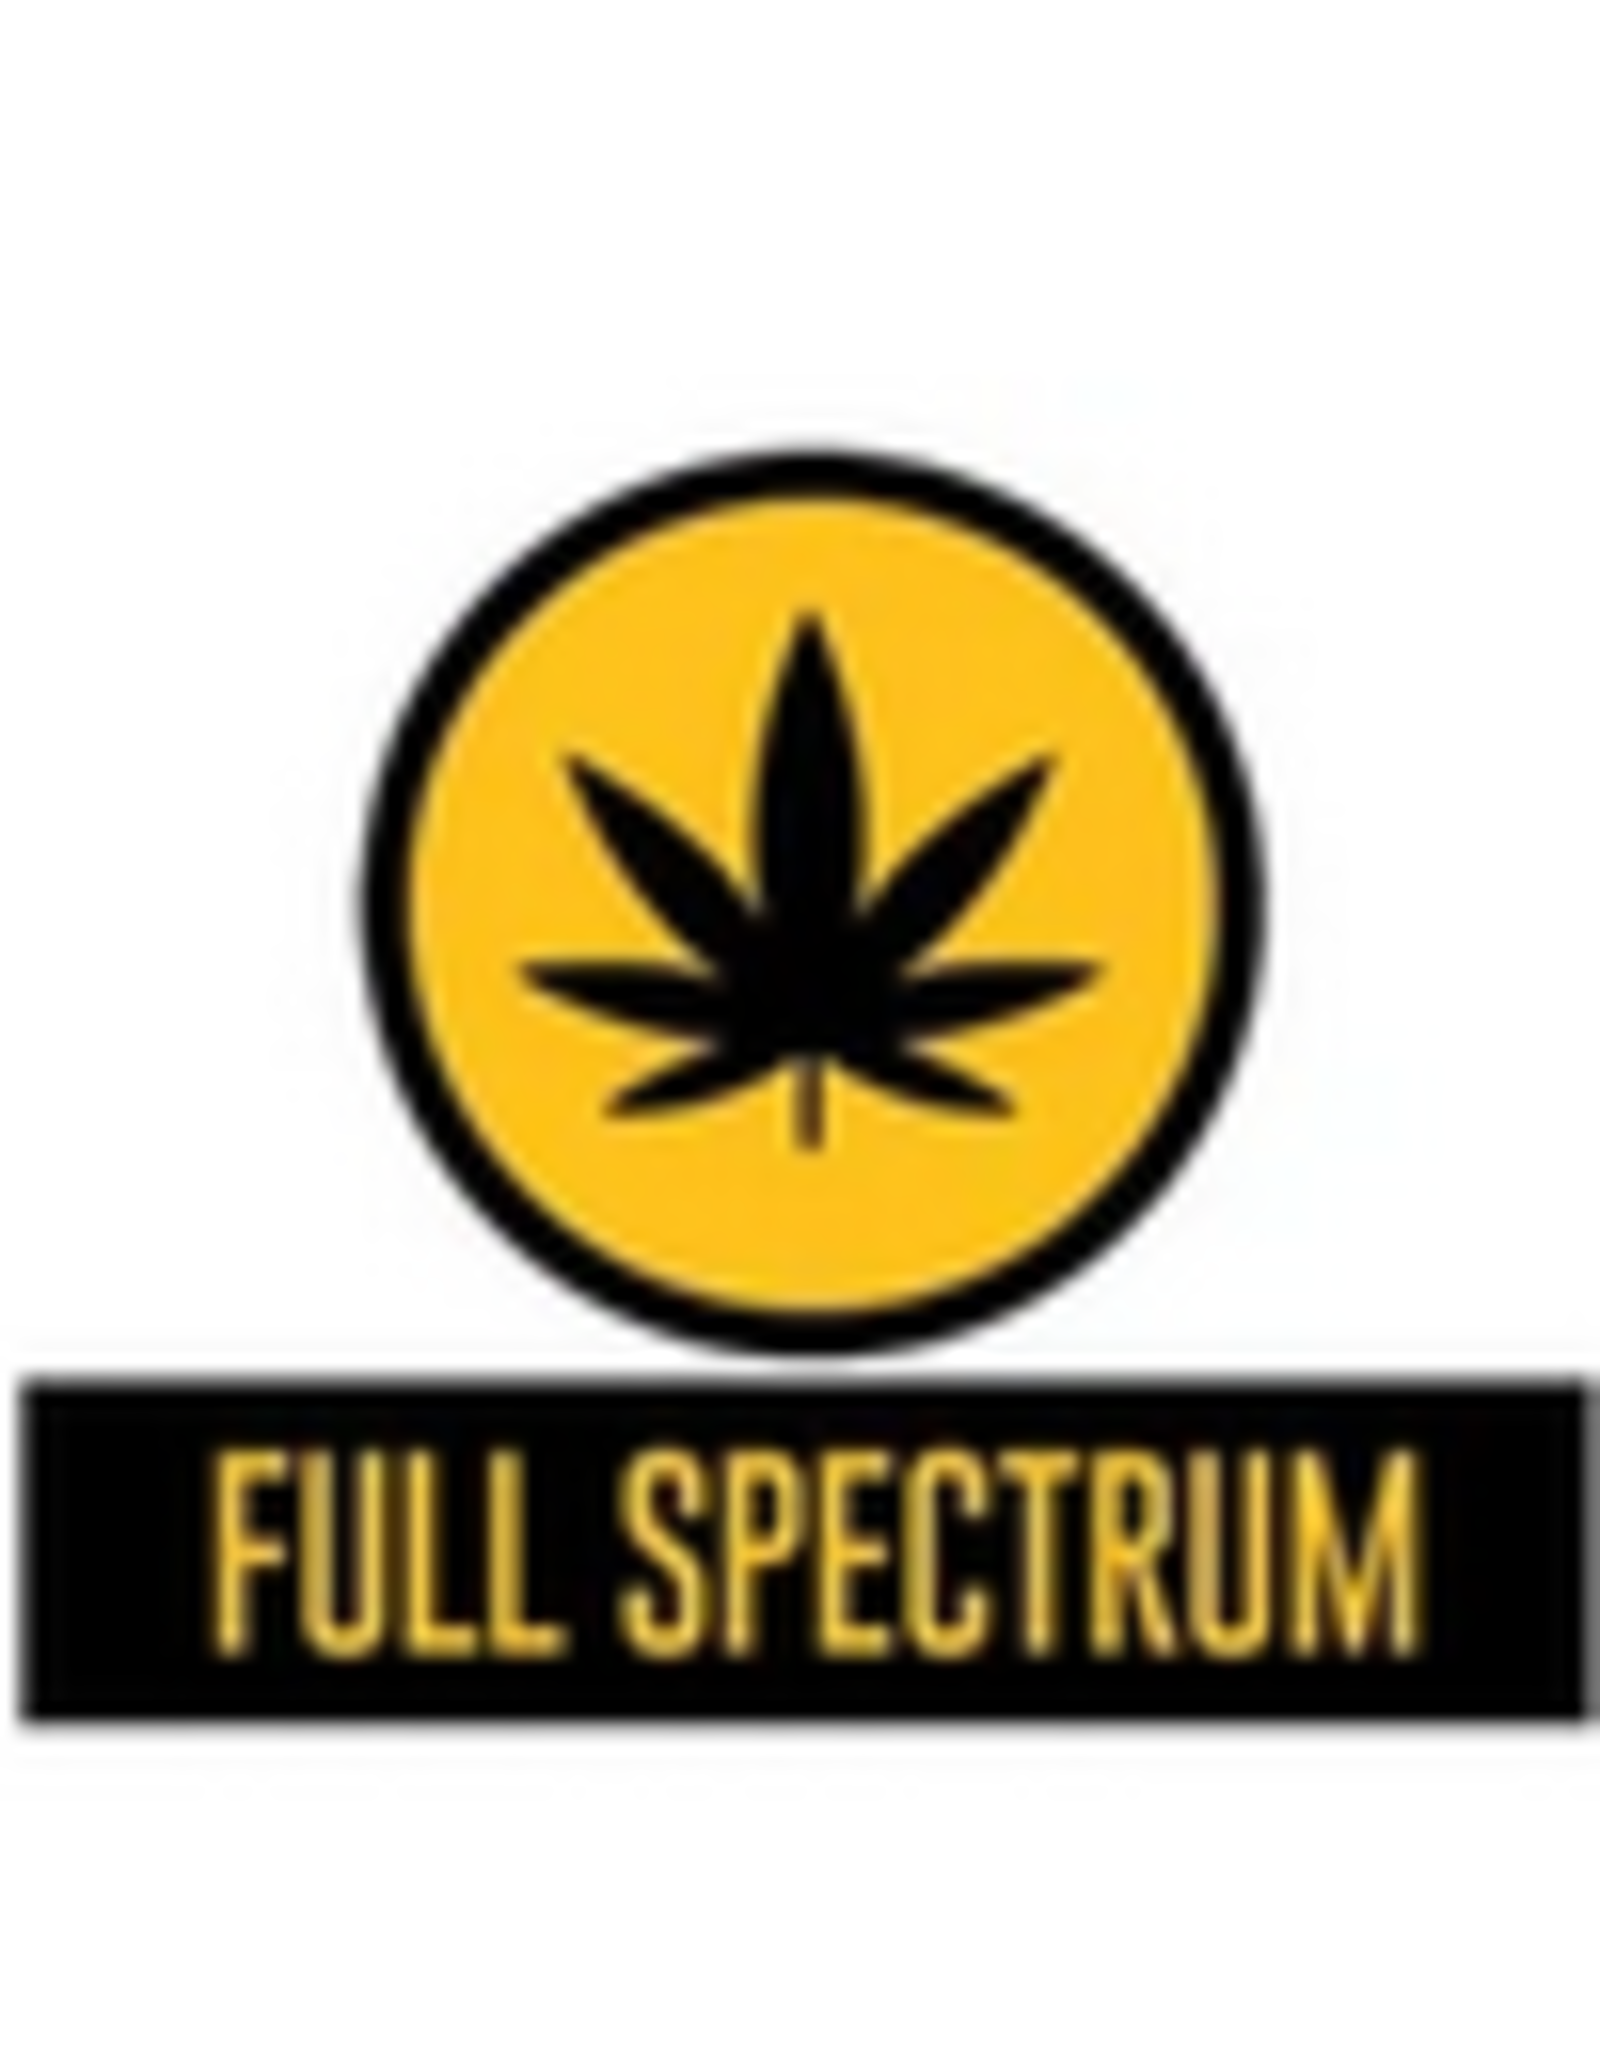 Best CBD Wellness Full Spectrum CBD TrainWreck Vape Cartridge 500mg 1ml